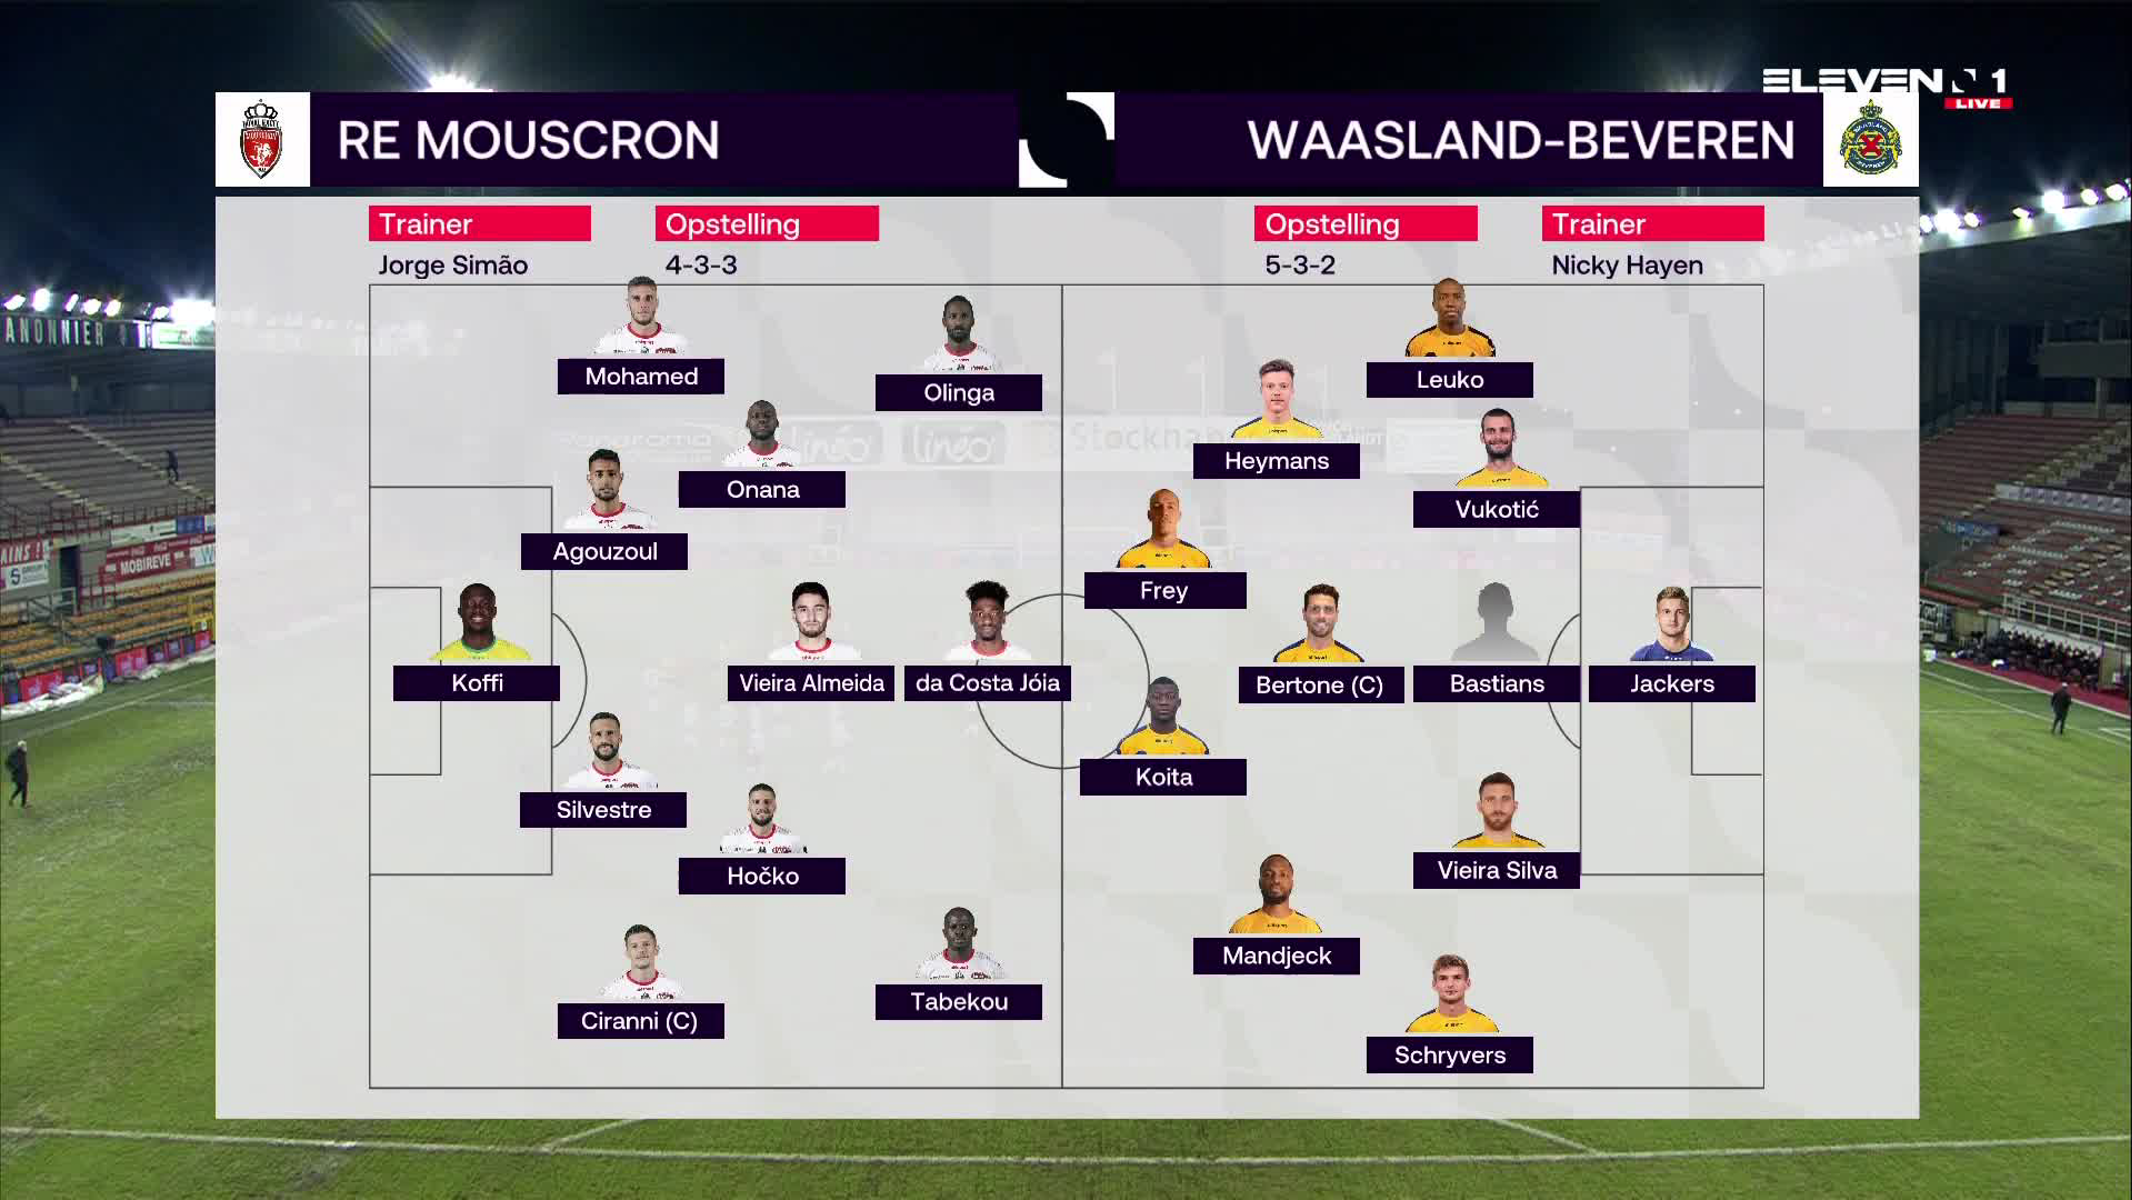 Samenvatting Royal Excel Mouscron vs. Waasland-Beveren